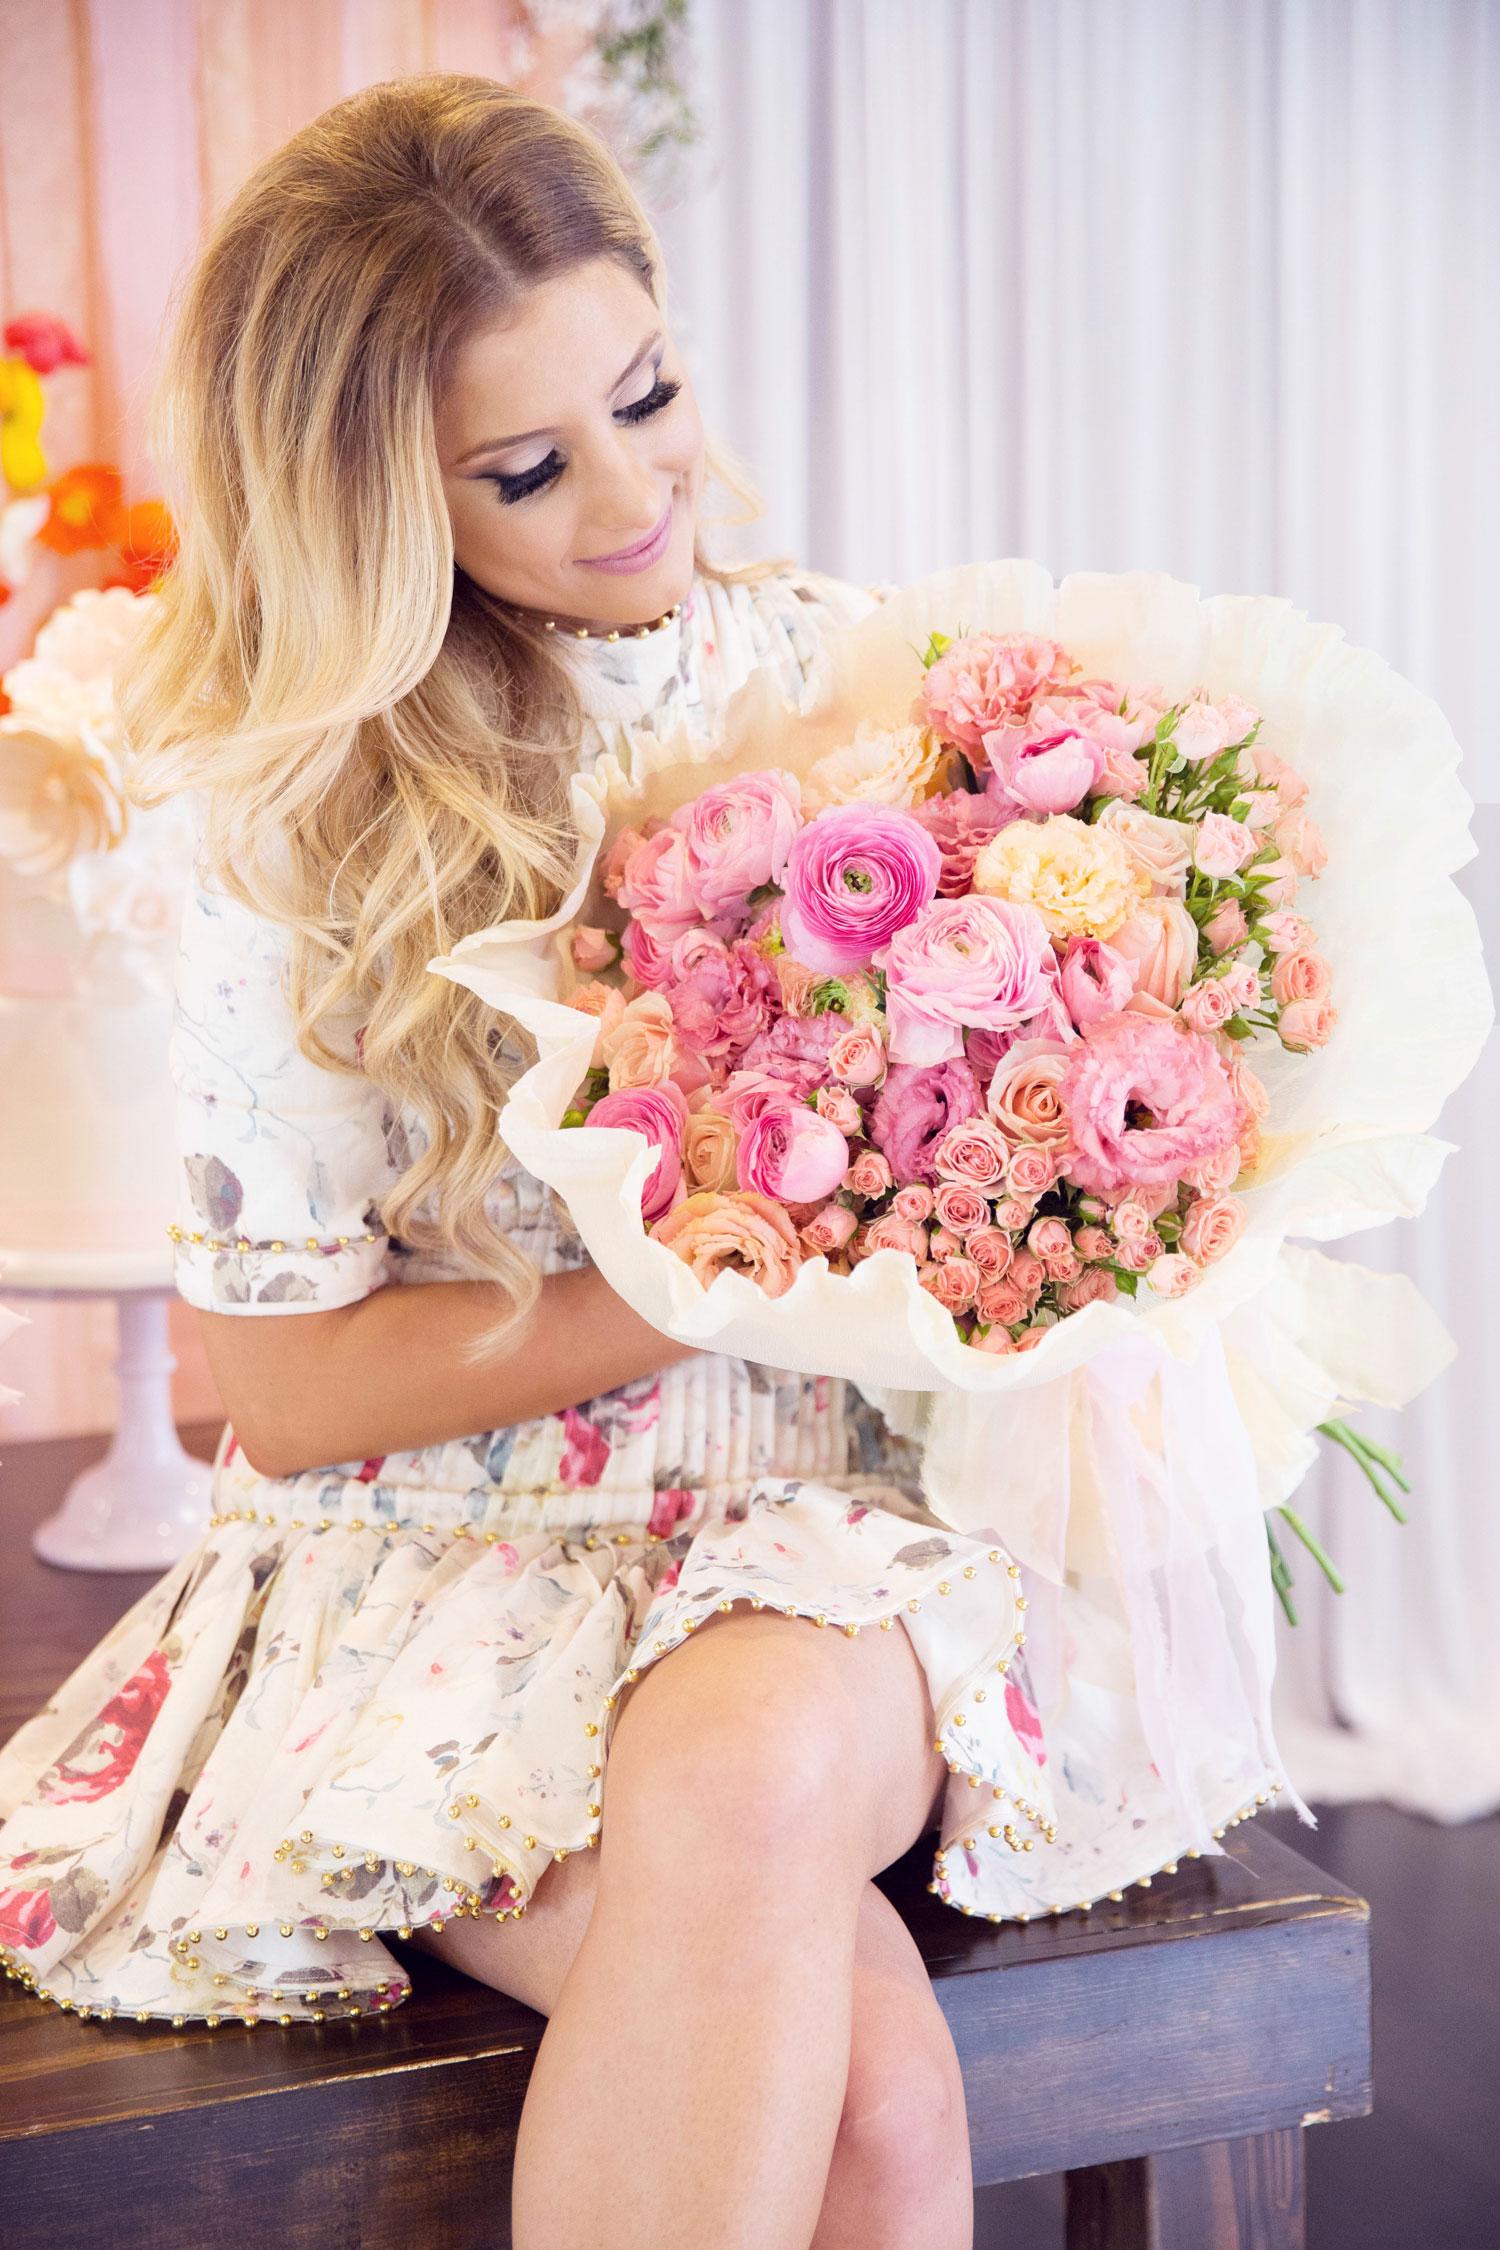 bride at bridal shower holding pink bouquet eddie zaratsian lifestyle and design